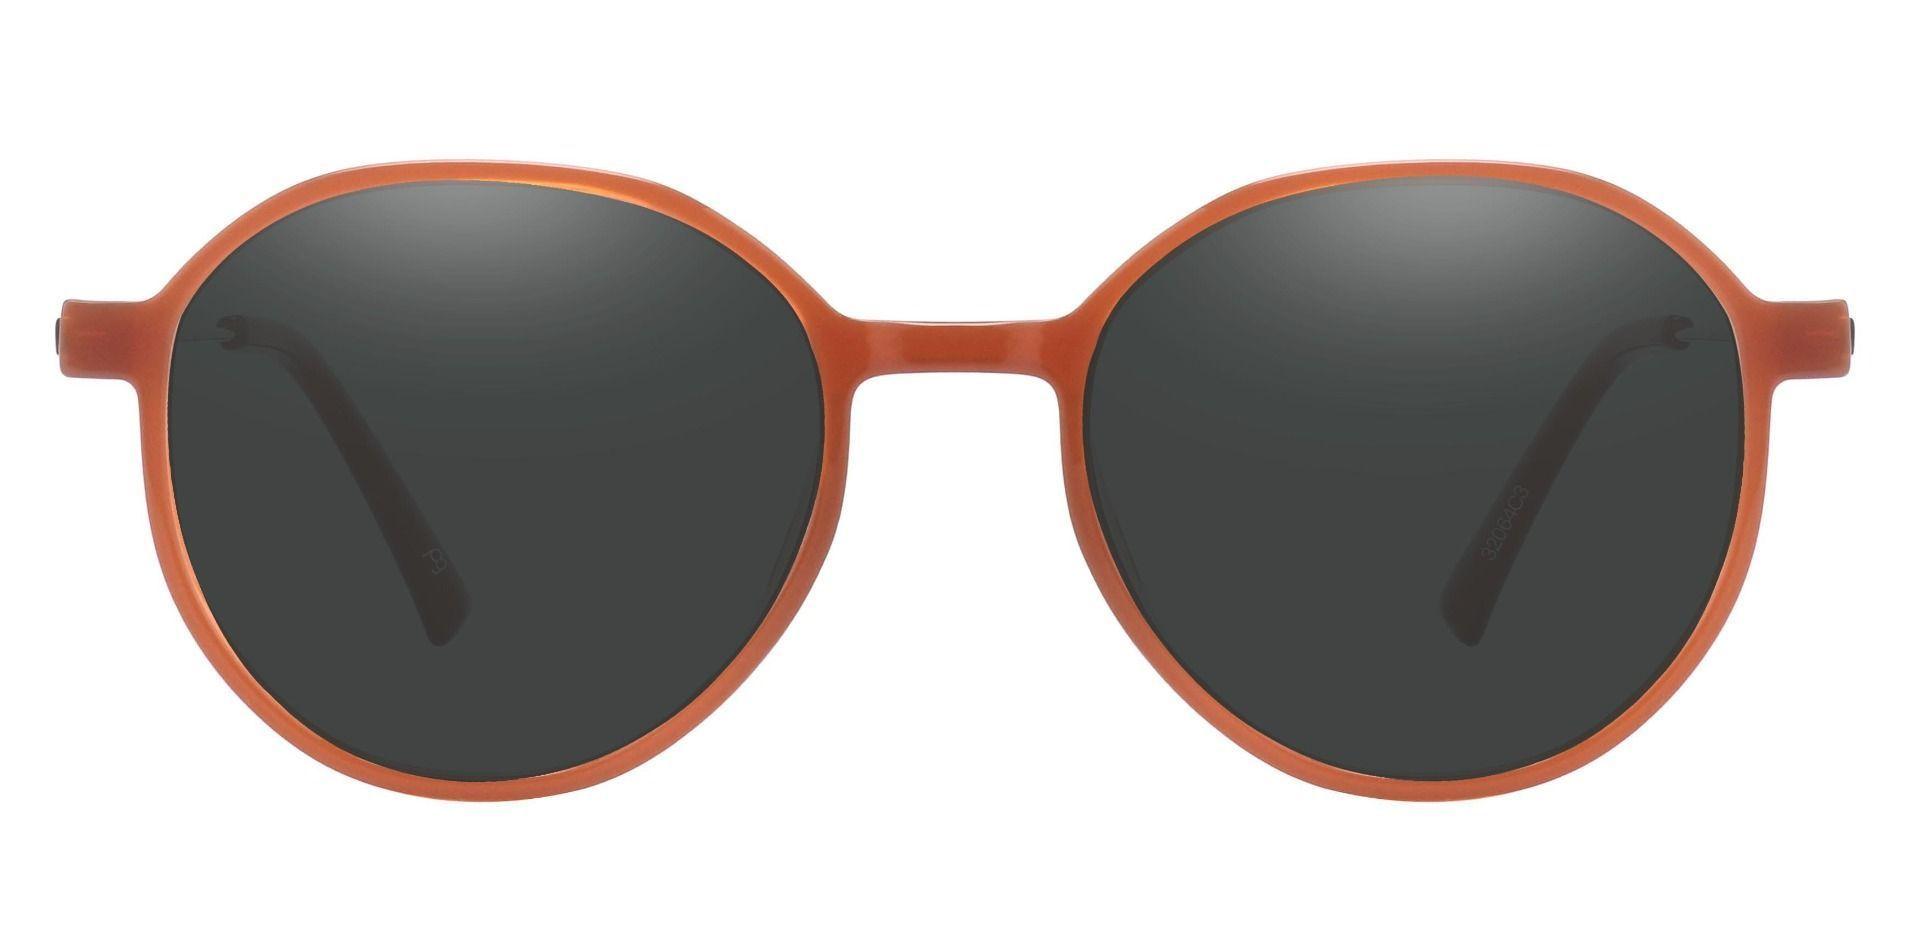 Daytona Geometric Non-Rx Sunglasses - Brown Frame With Gray Lenses